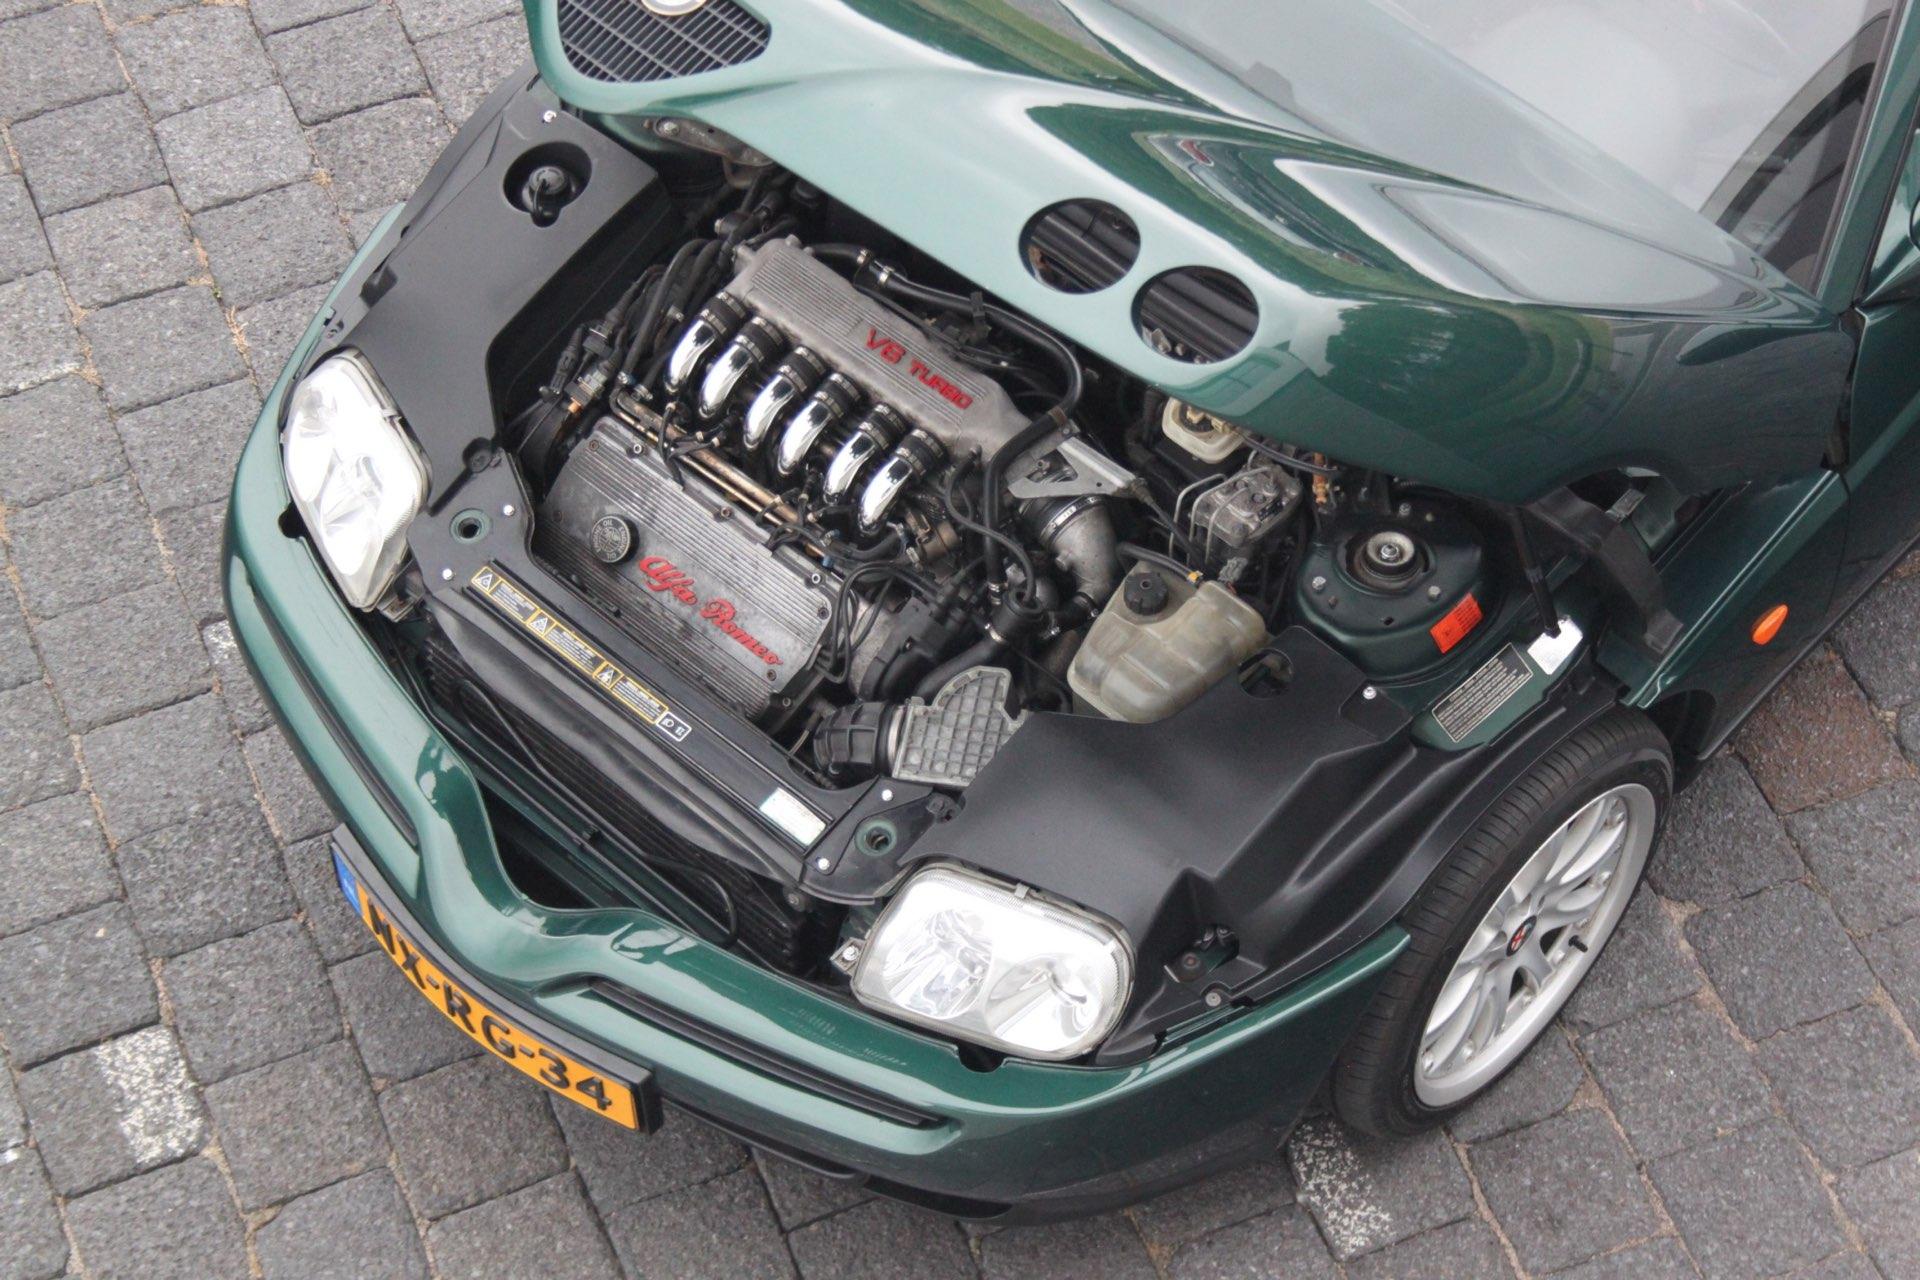 ALFA ROMEO GTV 2.0 V6 TURBO